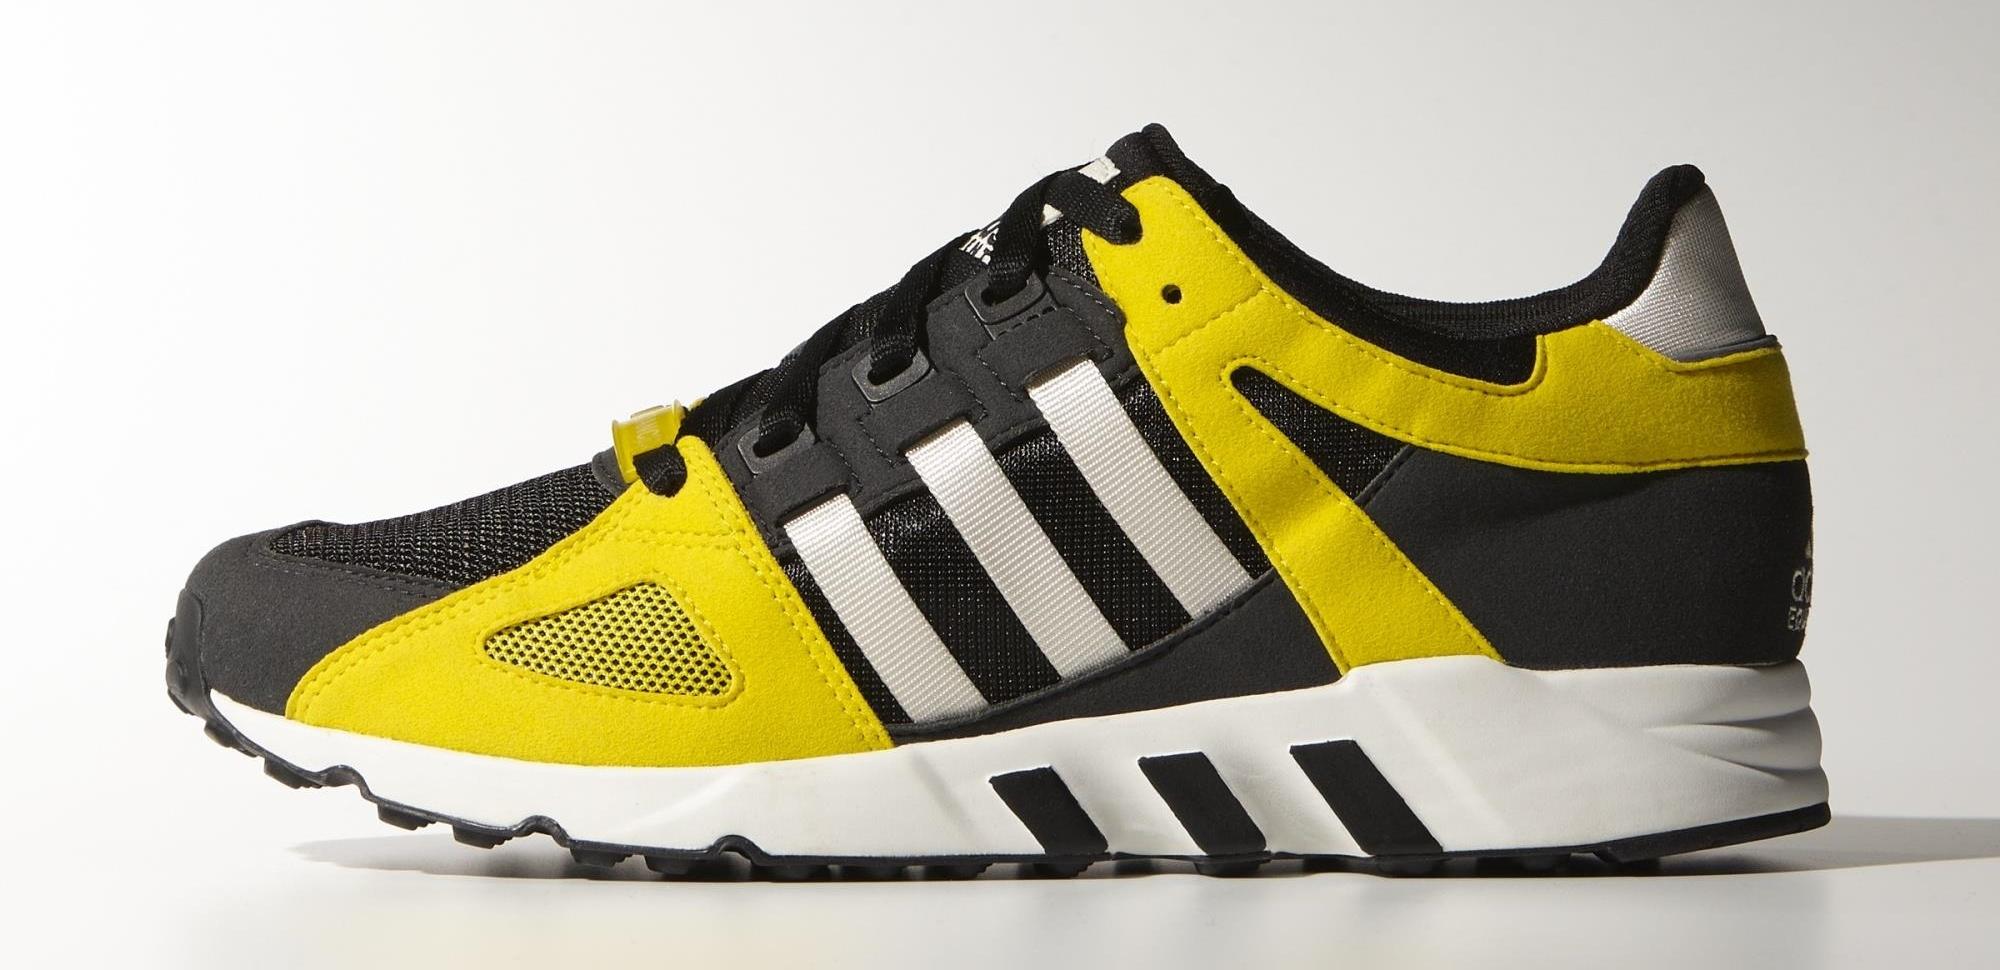 Adidas Originals EQT Guidance 93 Yellow